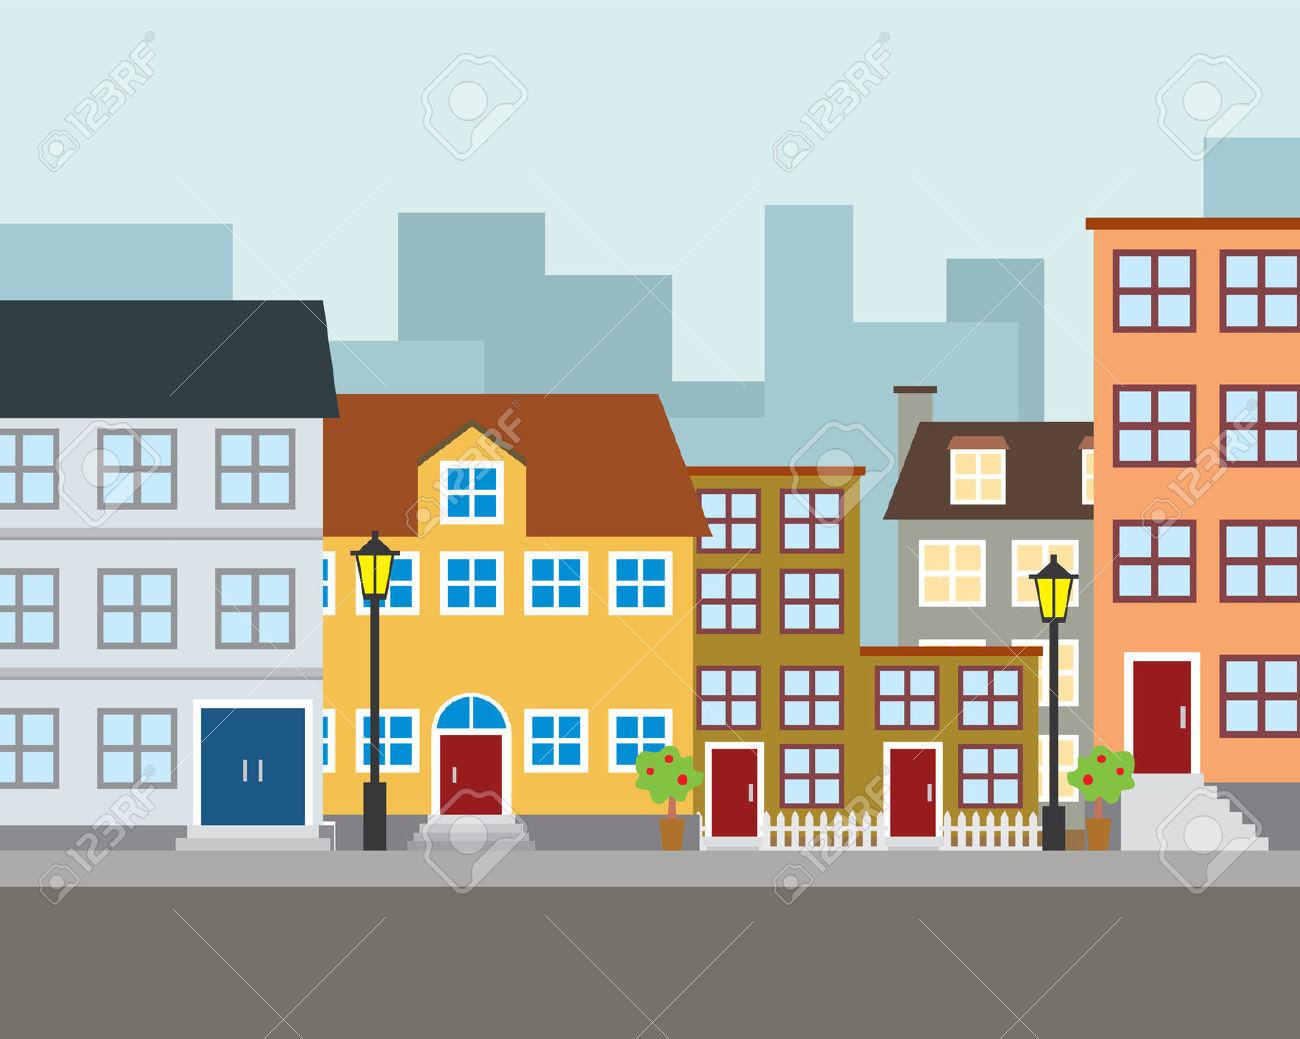 Neighborhood Clip Art, Neighborhood Free Clipart.